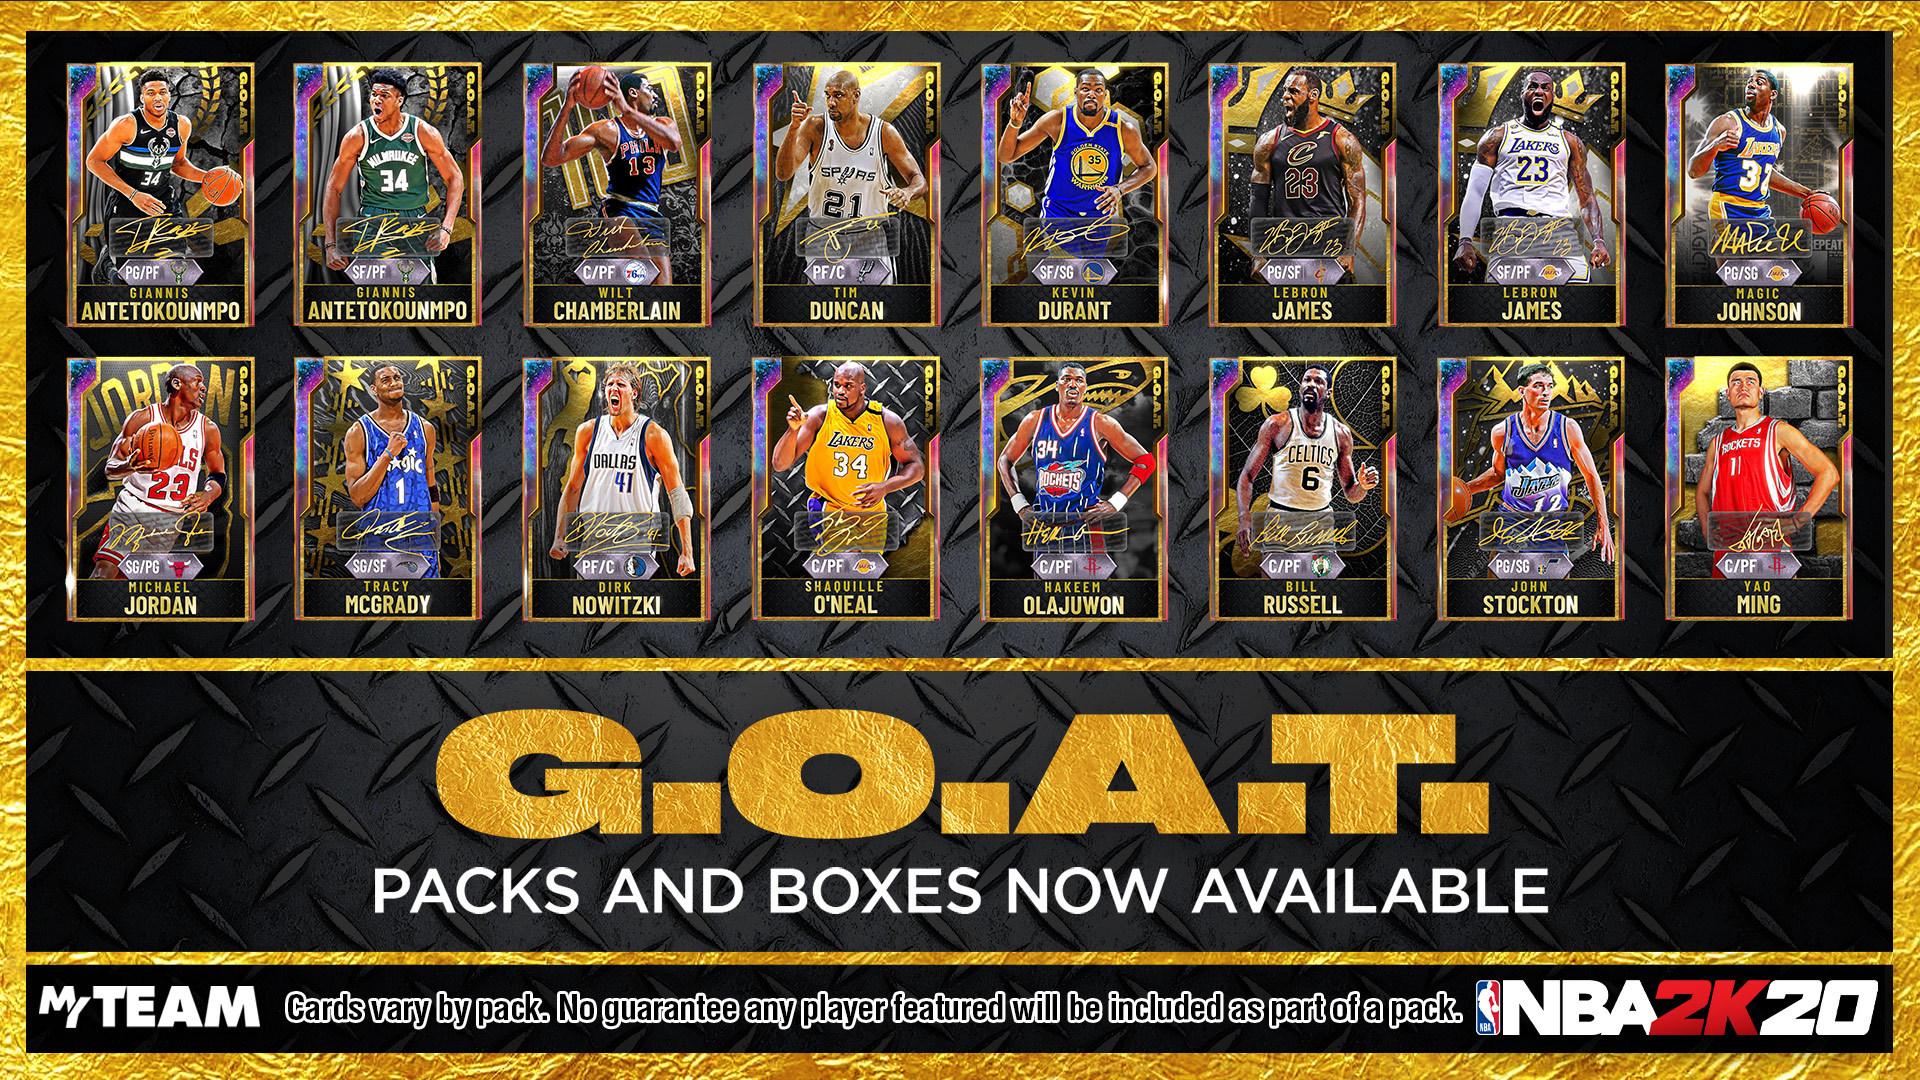 G.O.A.T. Packs